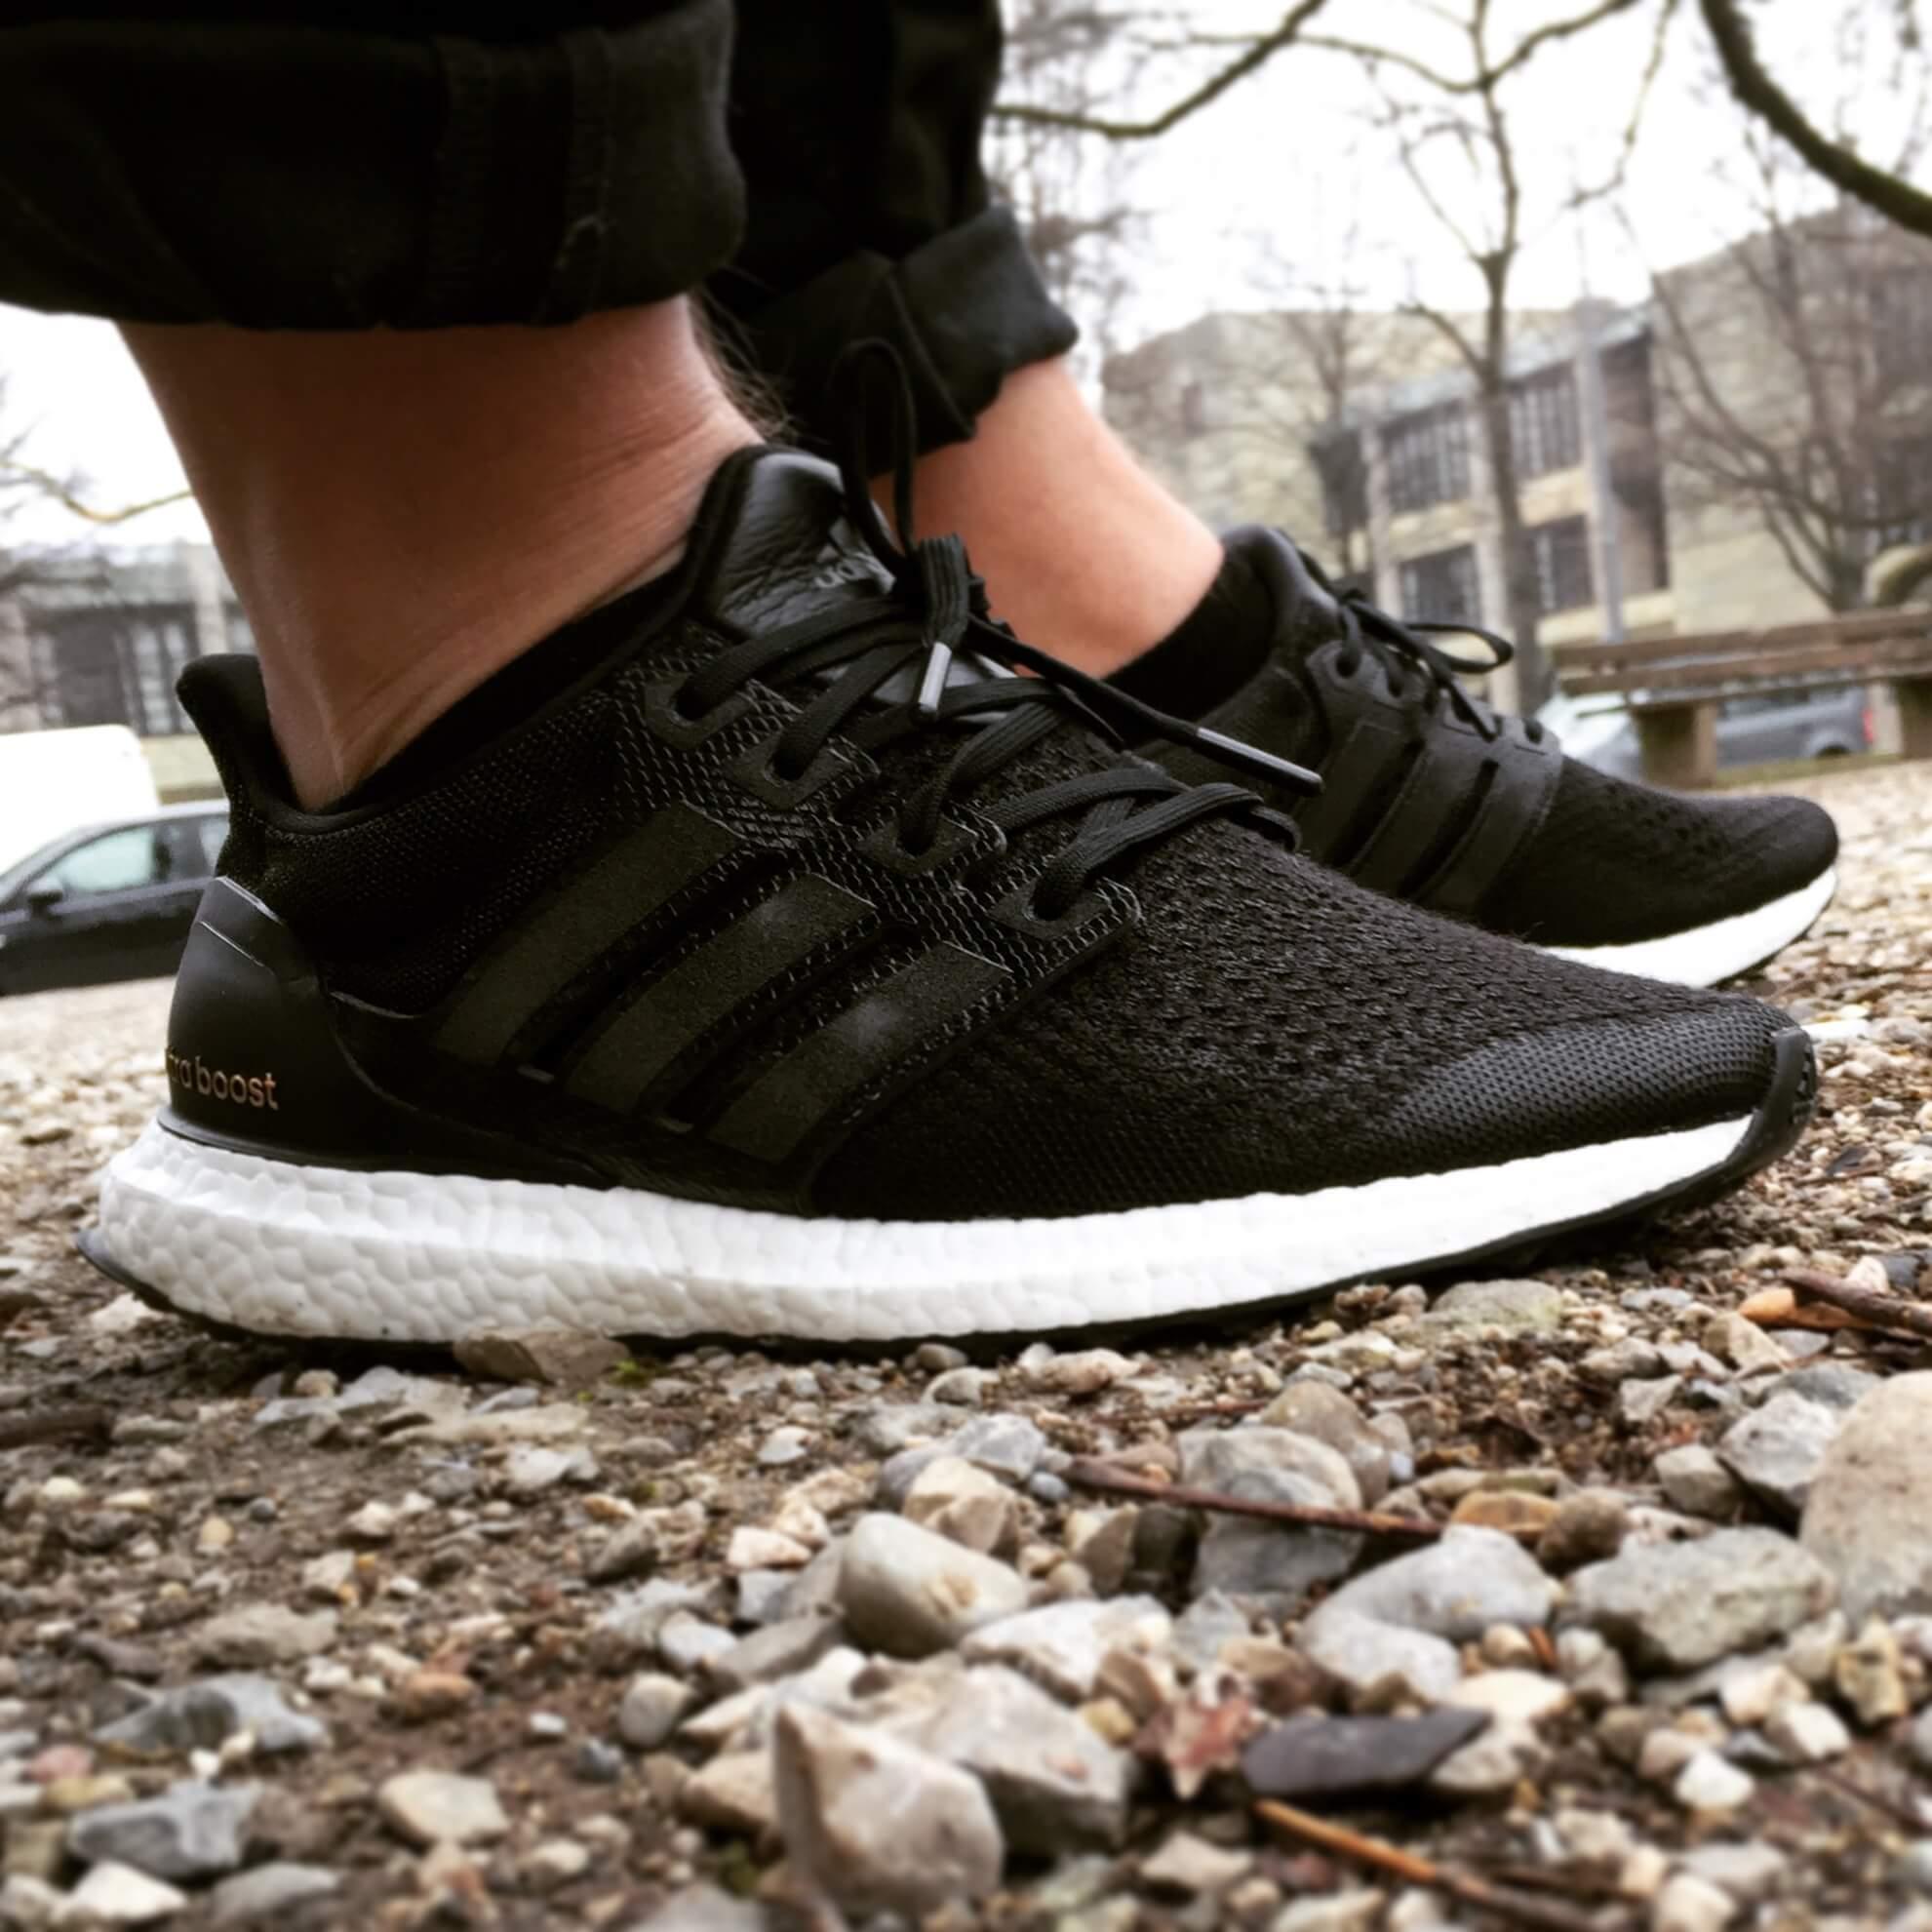 Adidas-Ultra Boost-J&D-Collective-Side-View-Alternate-Benstah-Onfeet